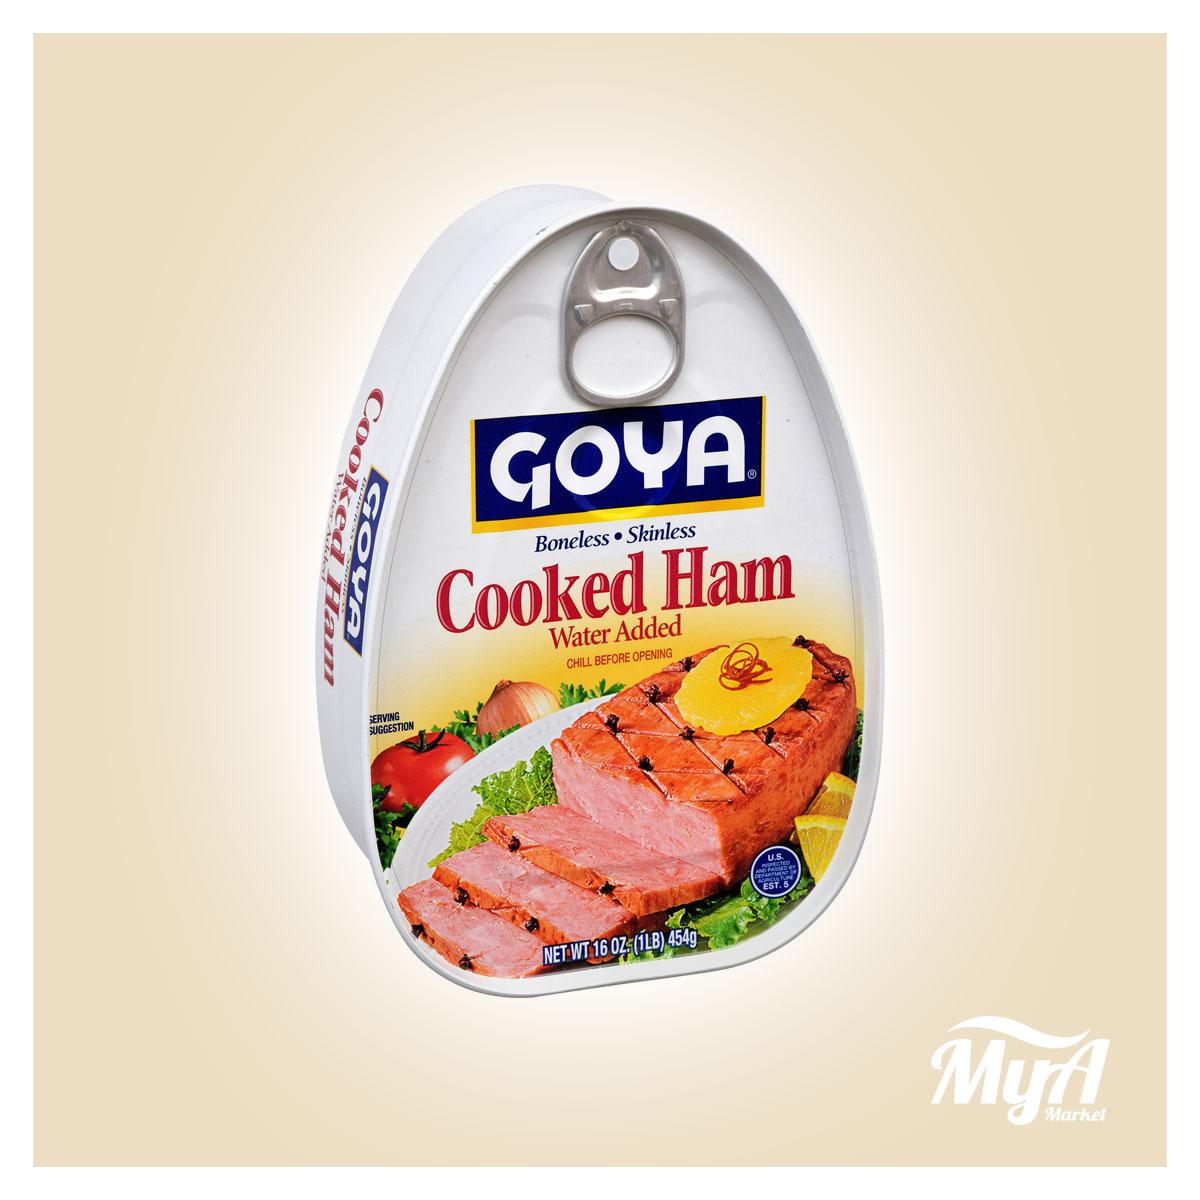 Cooked Ham Goya